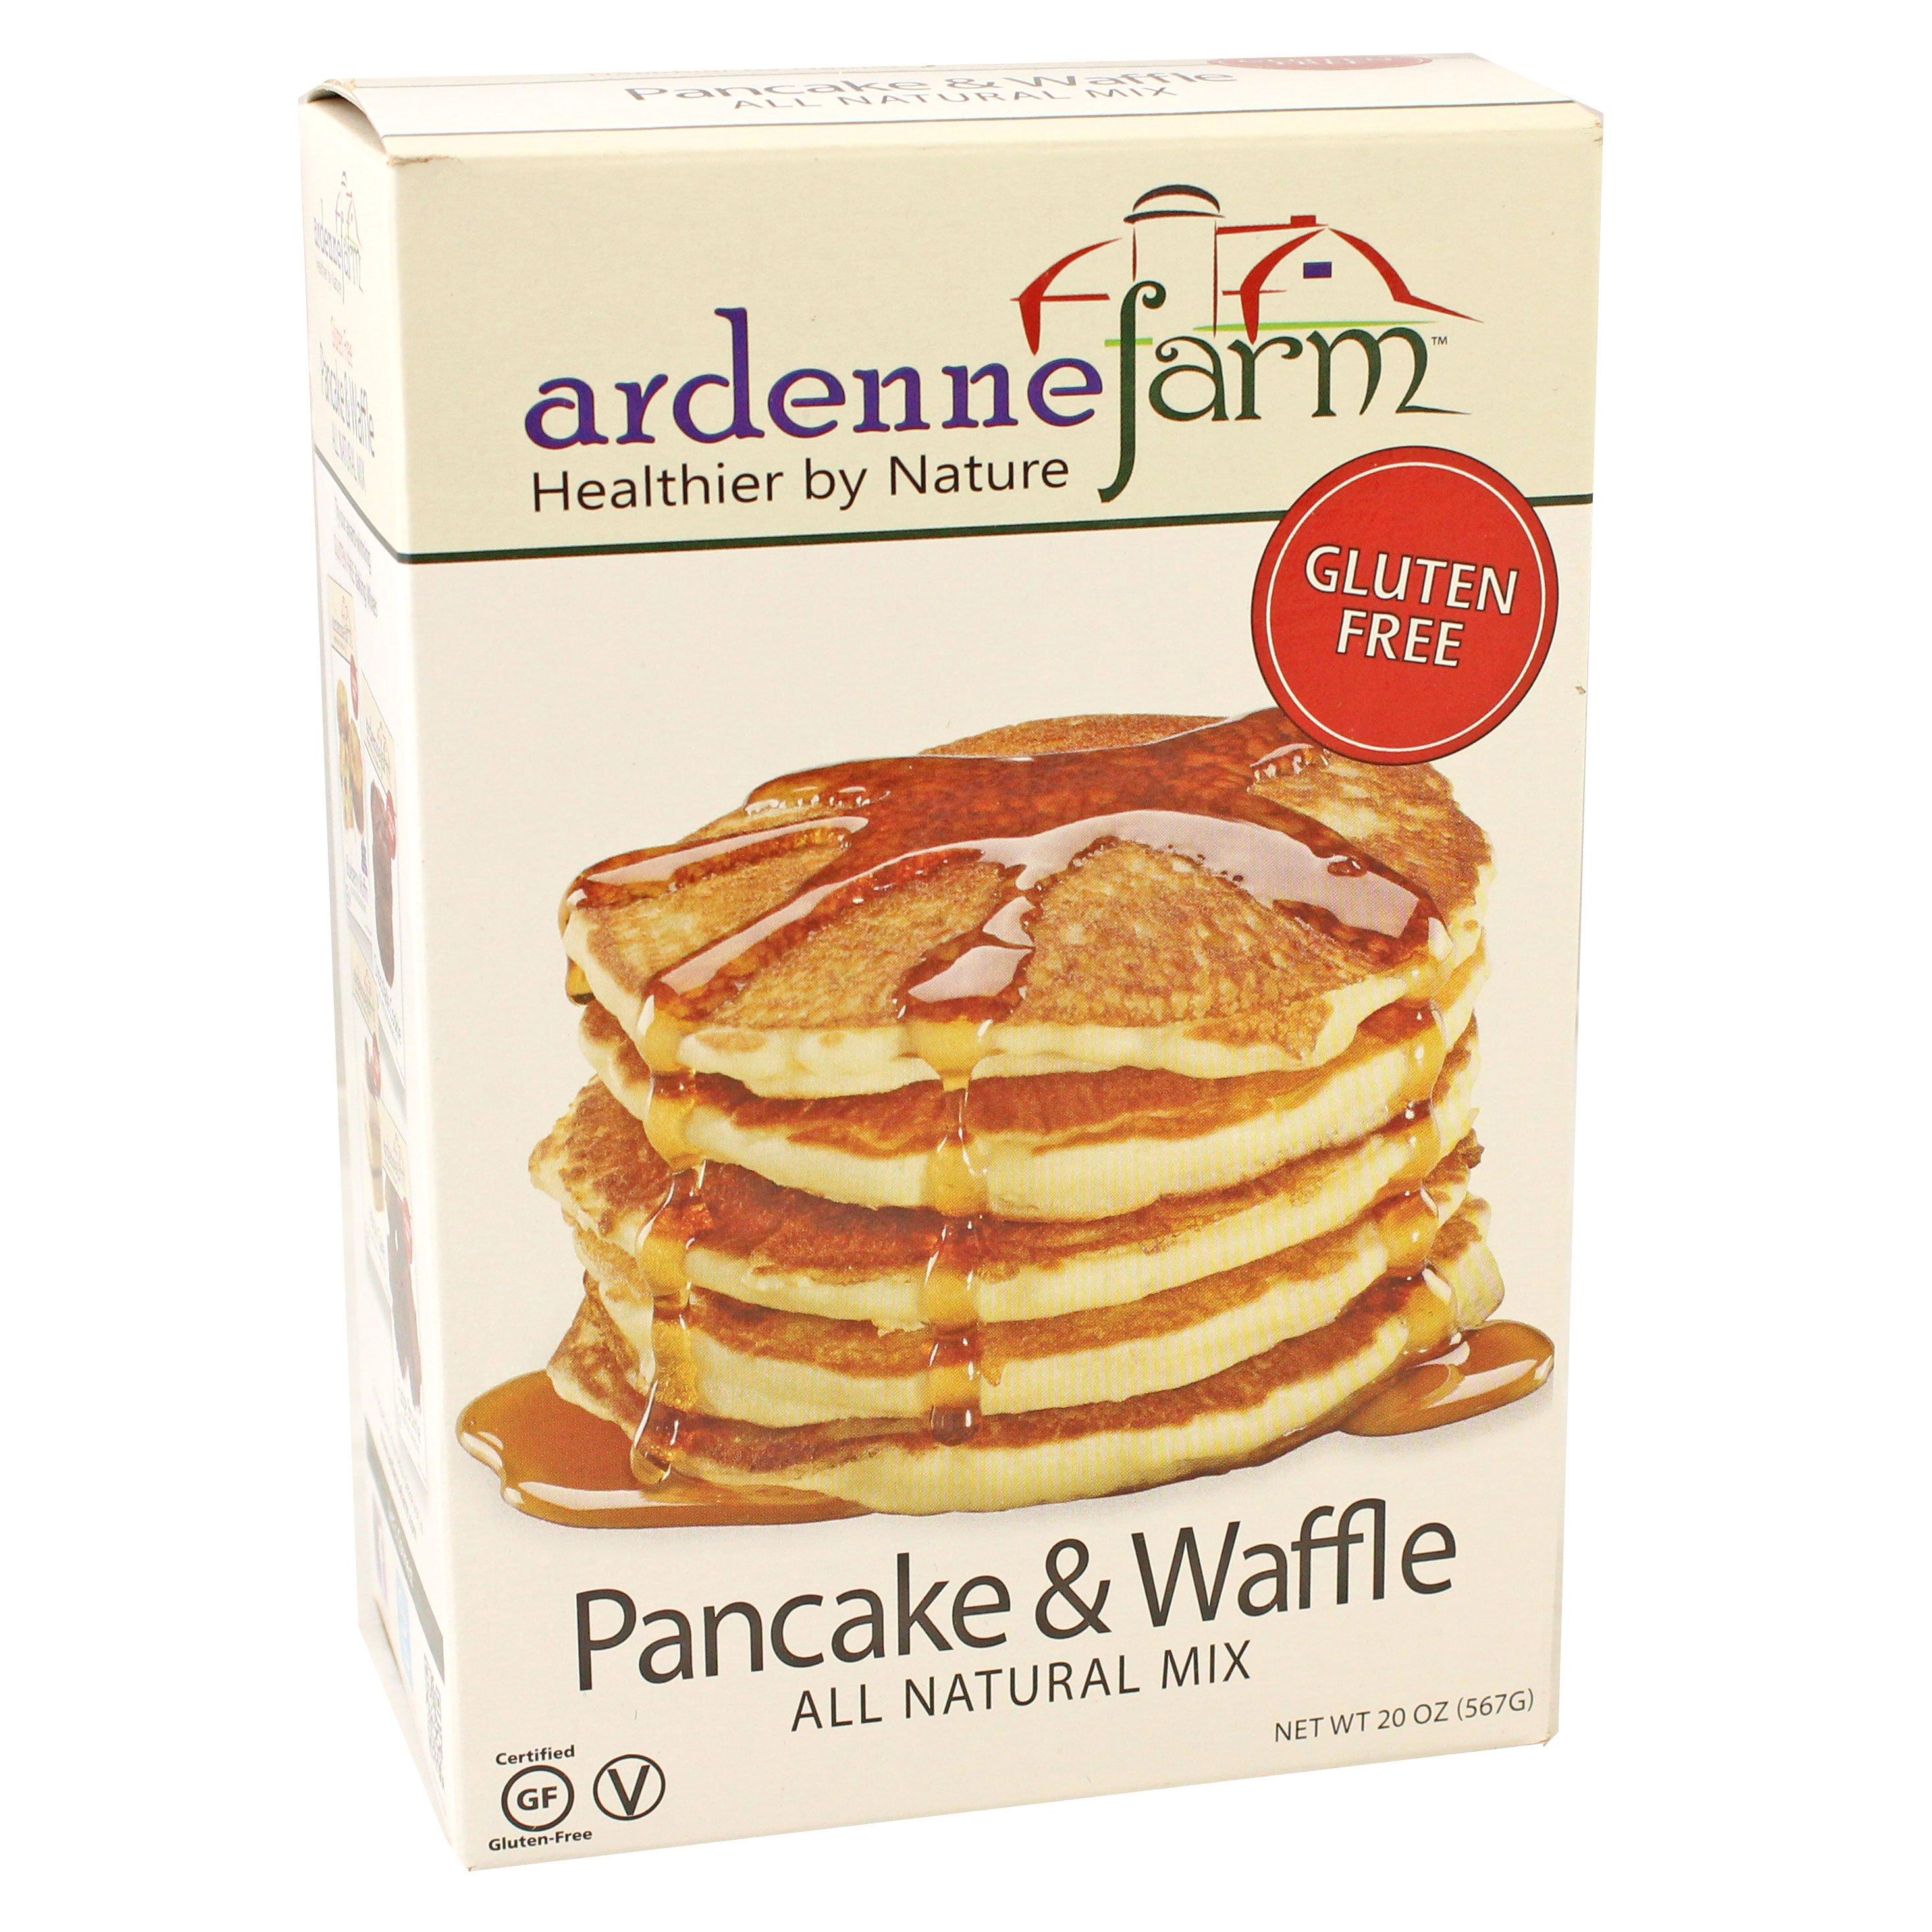 Ardenne Farm Gluten Free Pancake Waffle Mix - Shop Pancake ...